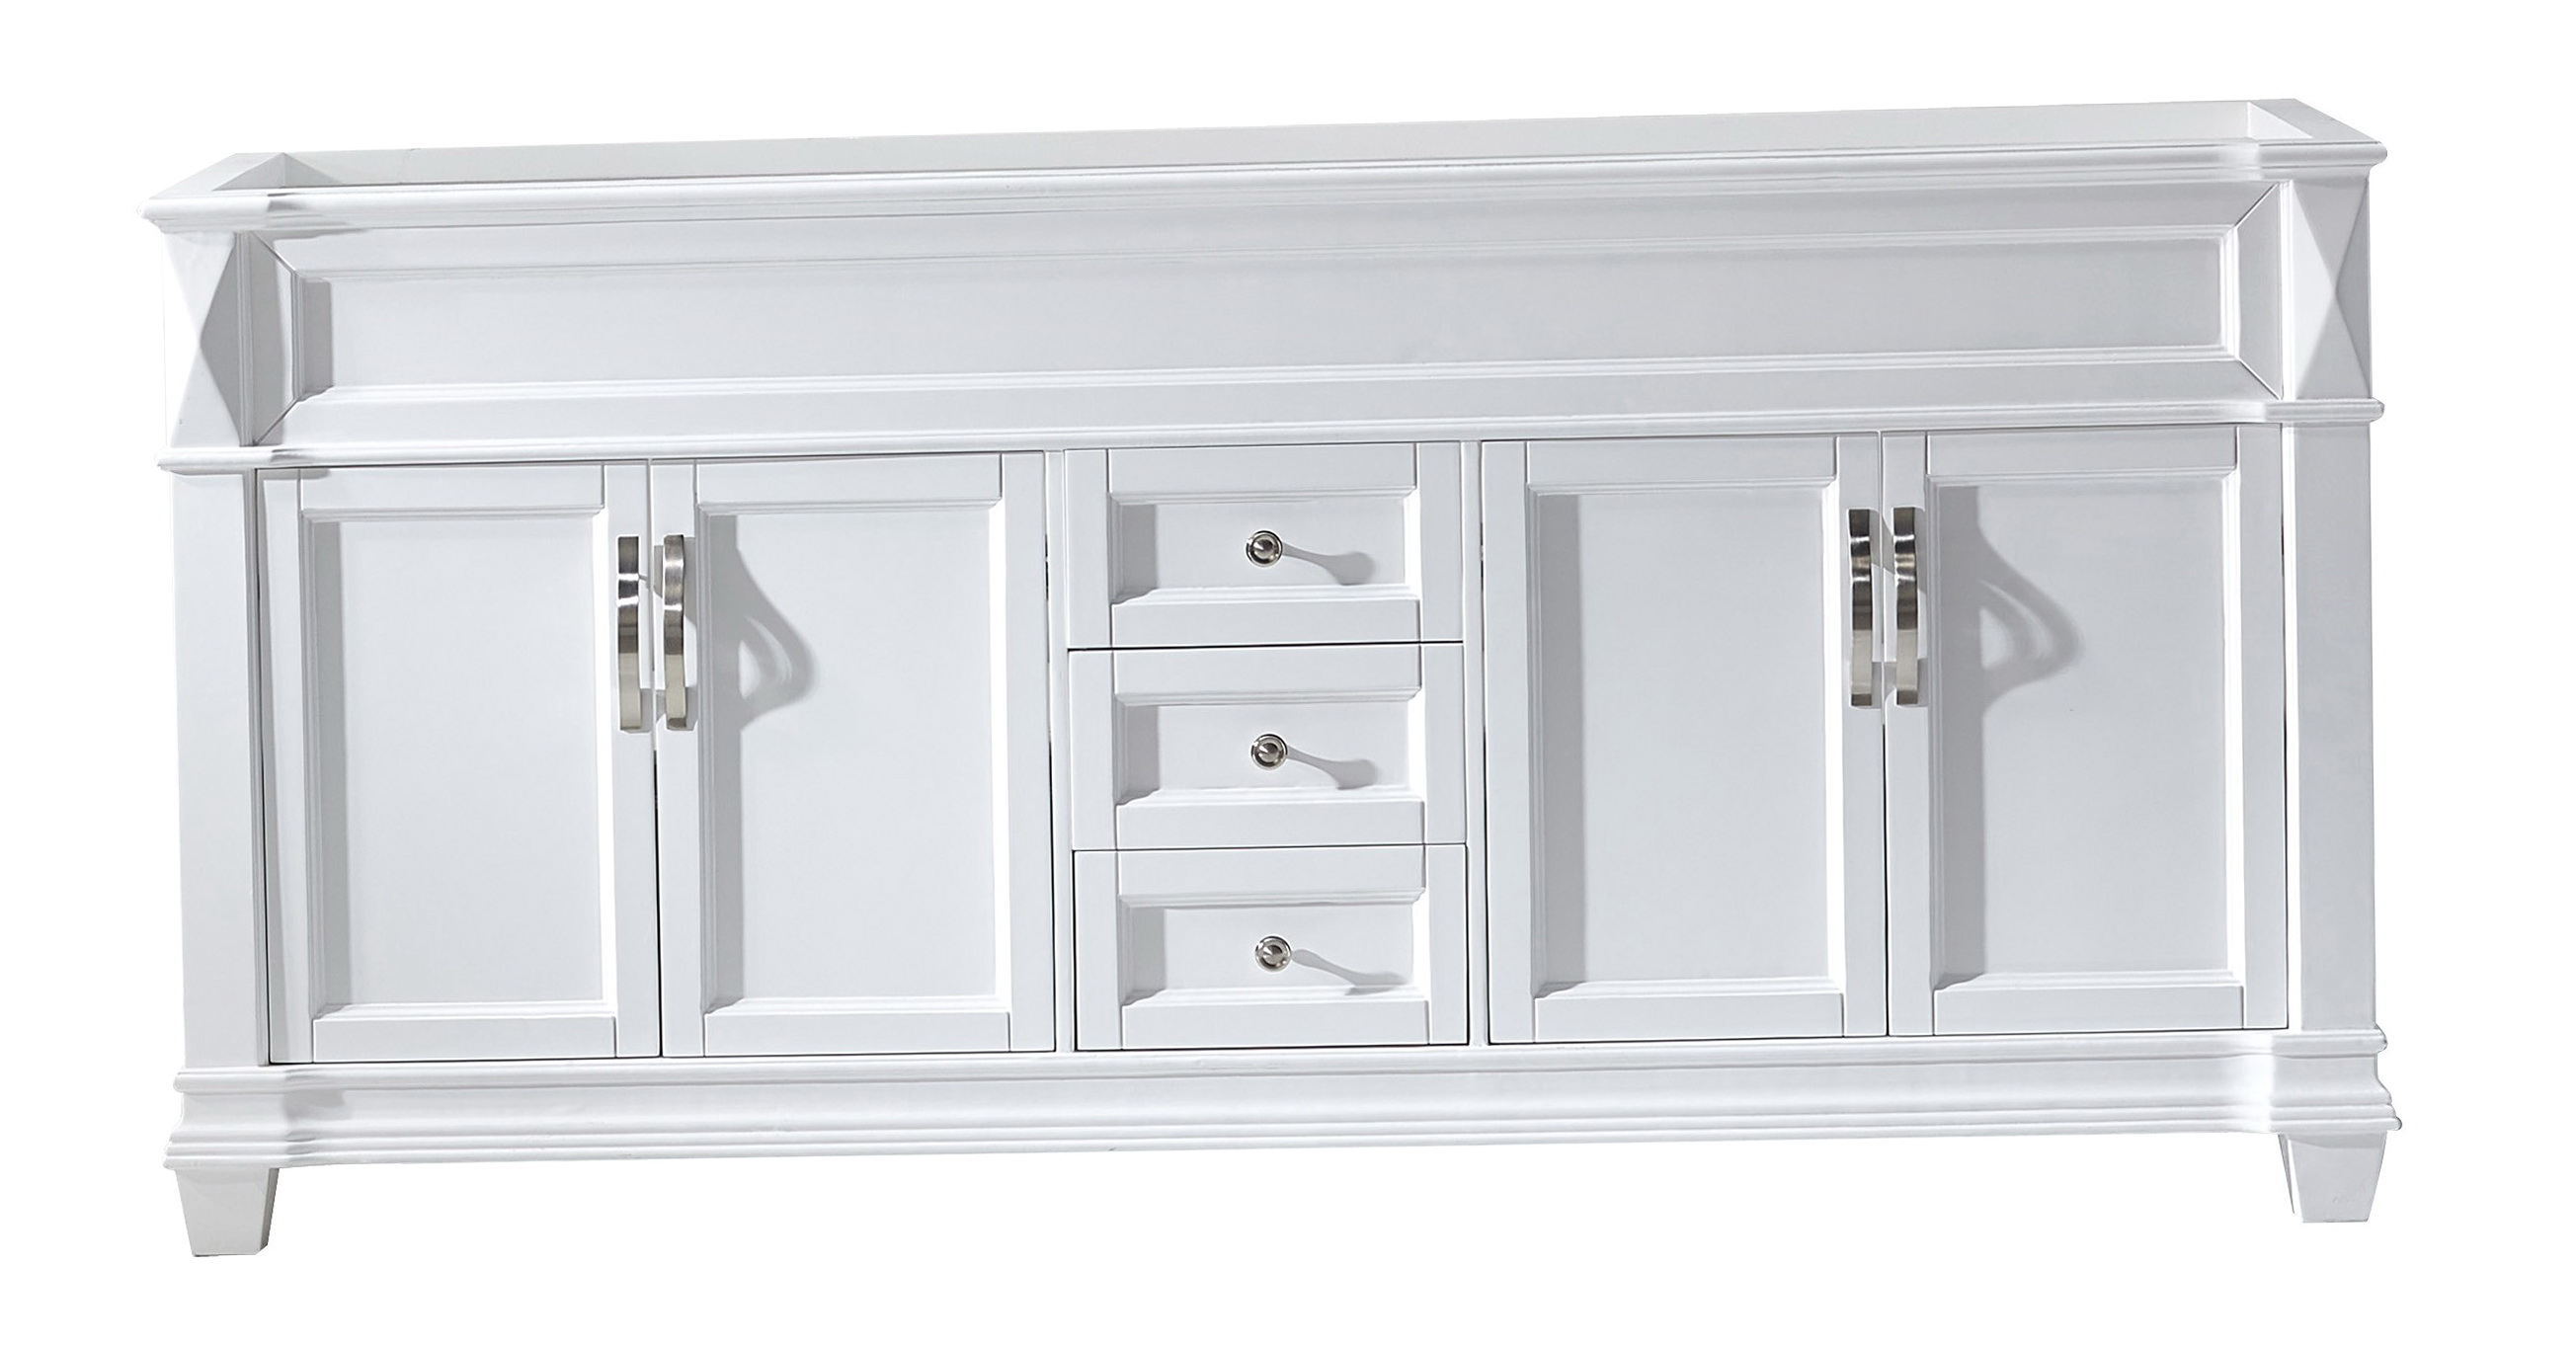 72 Bathroom Vanity Cabinet Only | Home Design Ideas